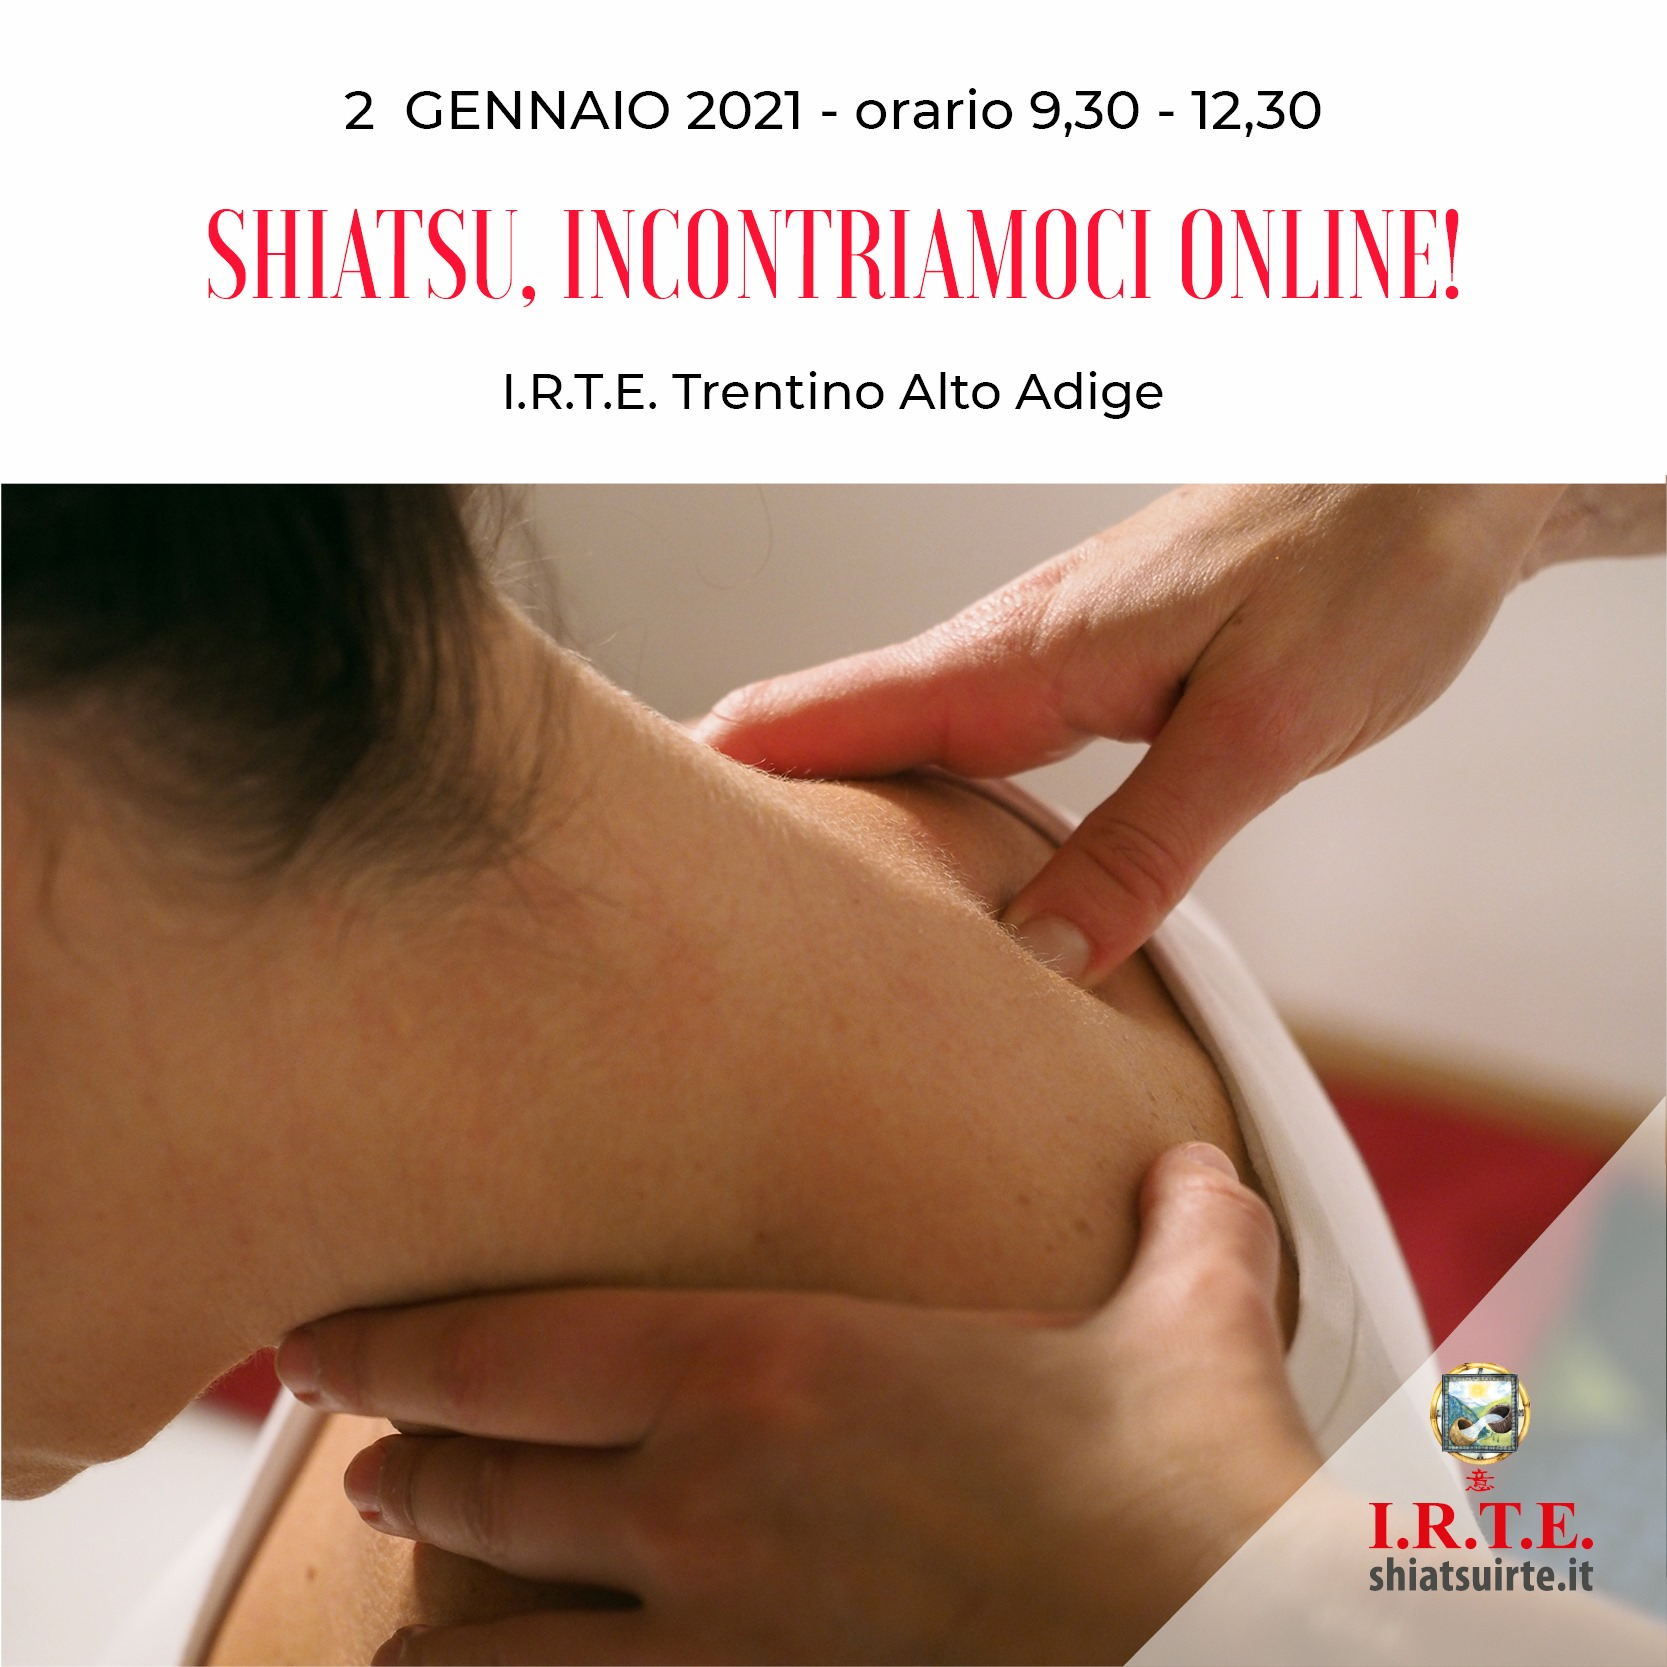 Trentino Alto Adige,                02 Gennaio 2021 Incontriamoci Online!